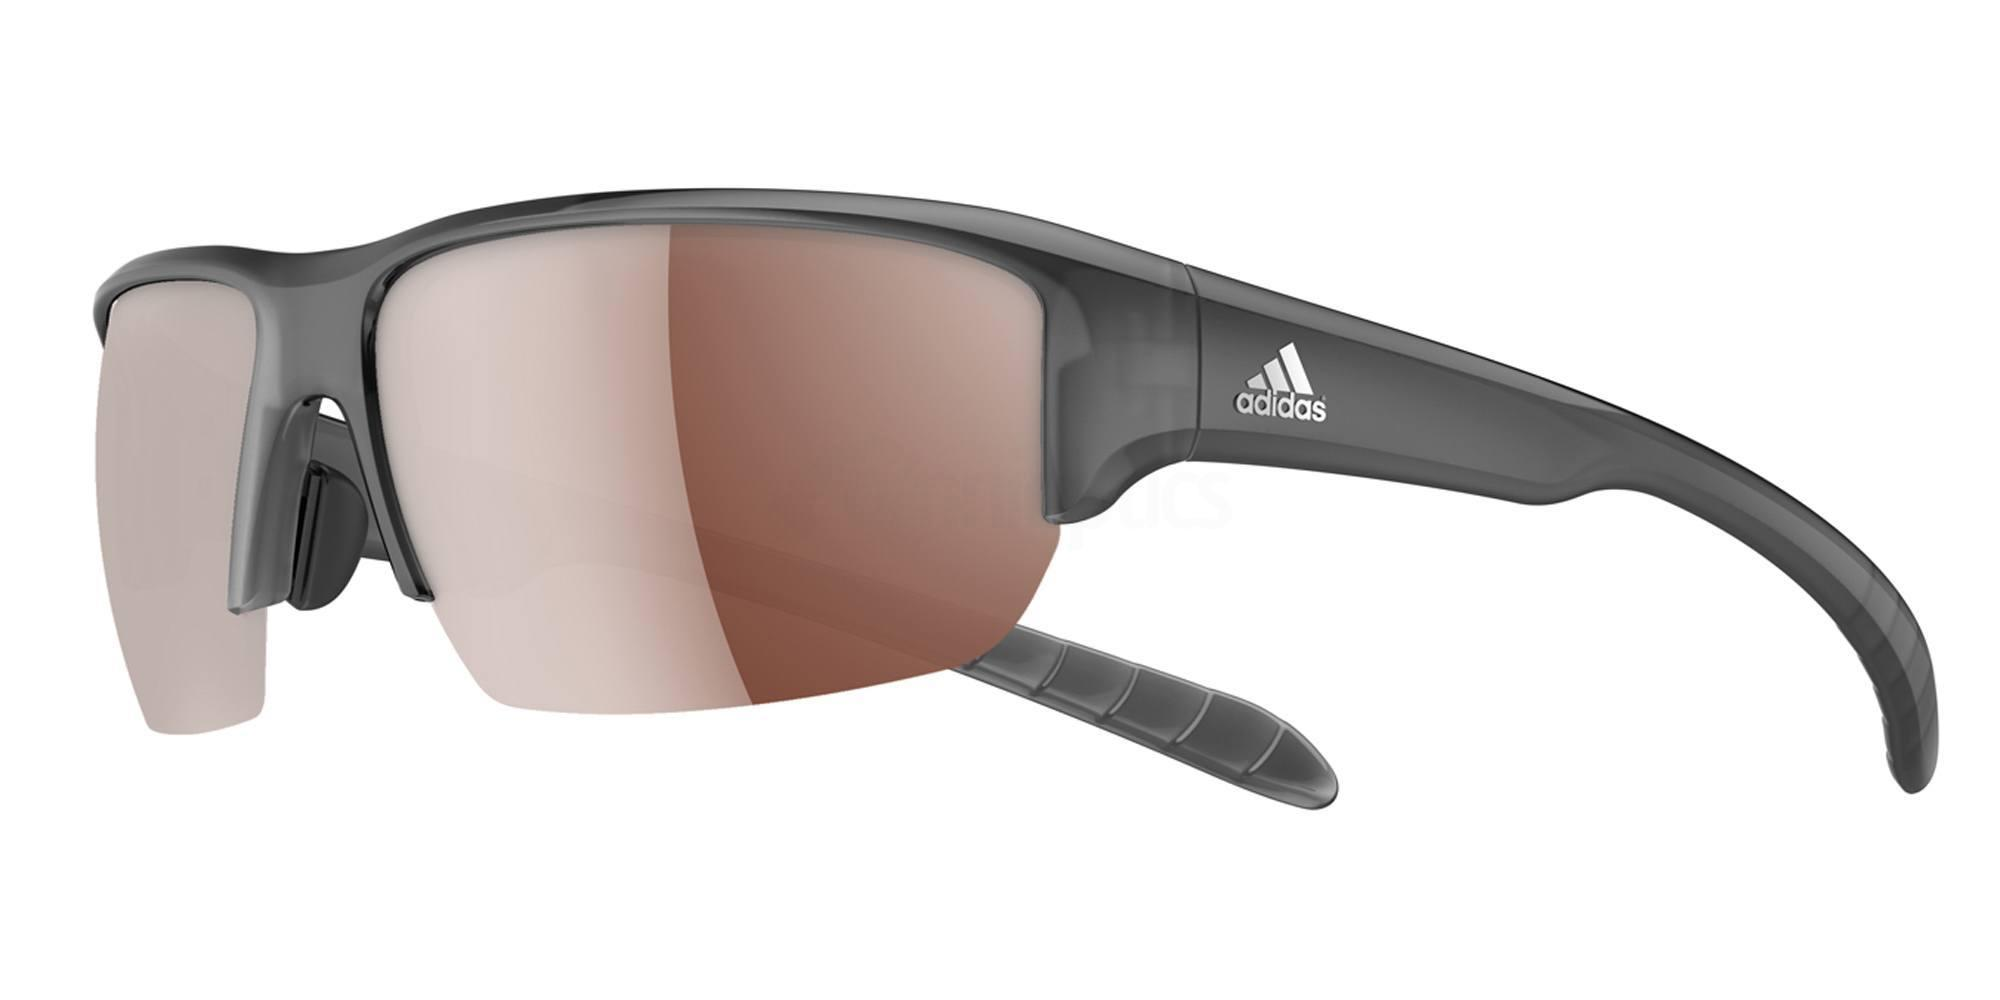 a421 00 6050 a421 Kumacross Halfrim Sunglasses, Adidas